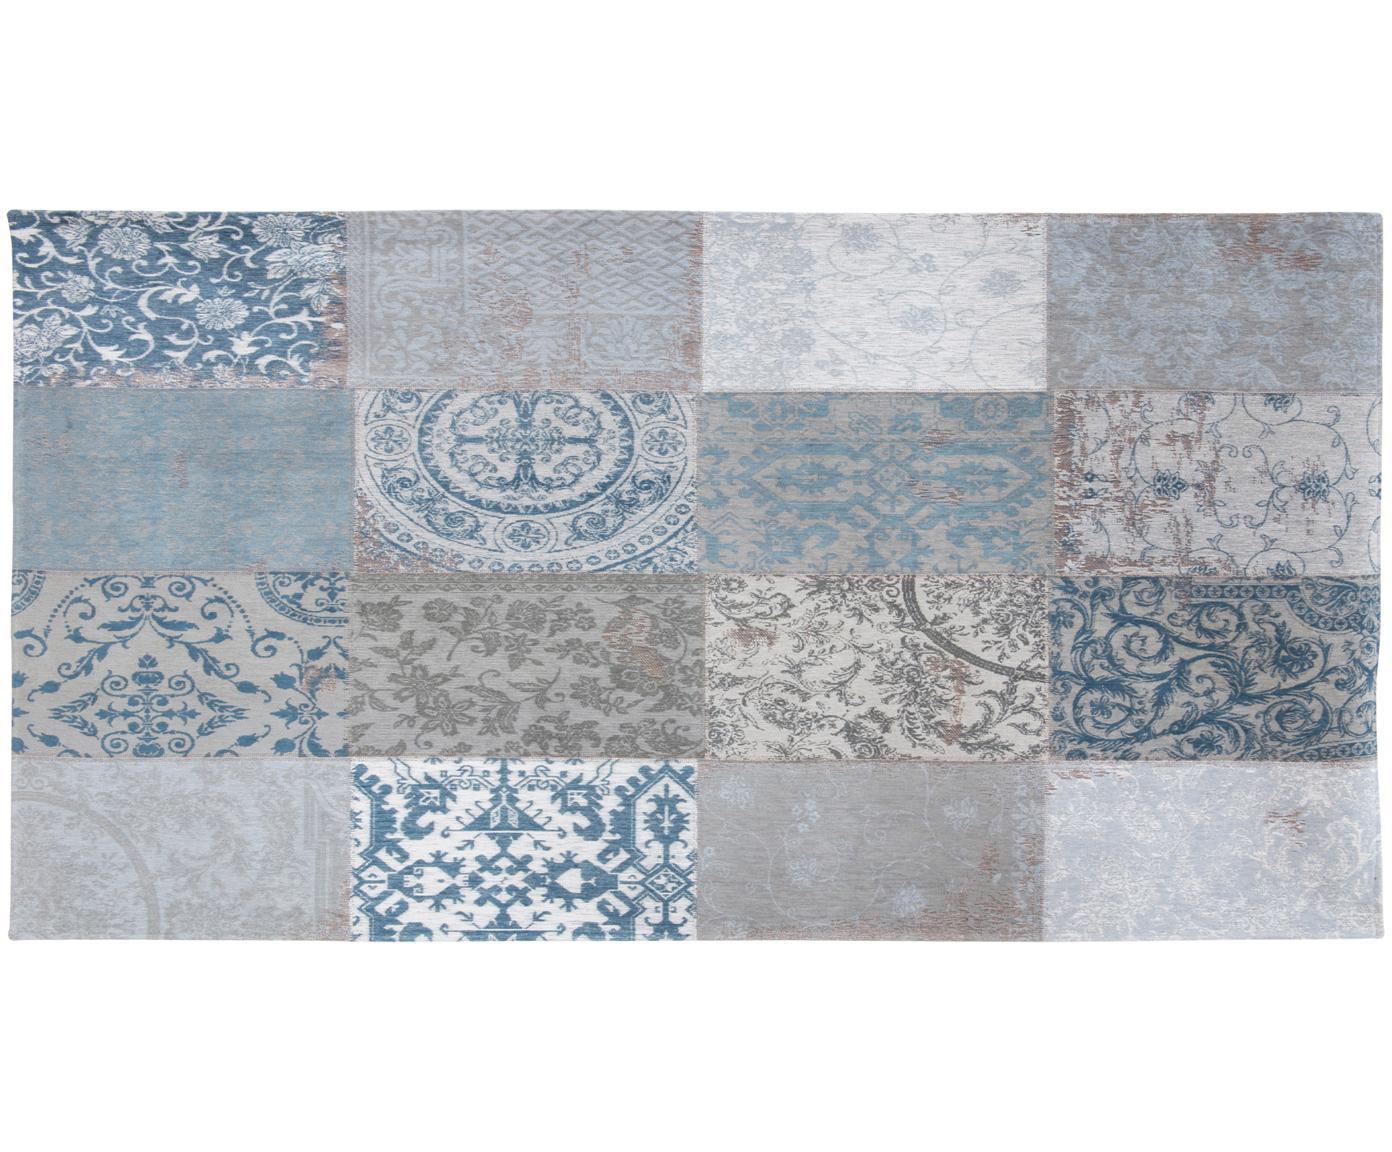 Alfombra de cheinilla Multi, Parte superior: 85%chenilla (algodón), 1, Reverso: mezcla de algodón, recubi, Azul, gris, An 80 x L 150 cm (Tamaño XS)